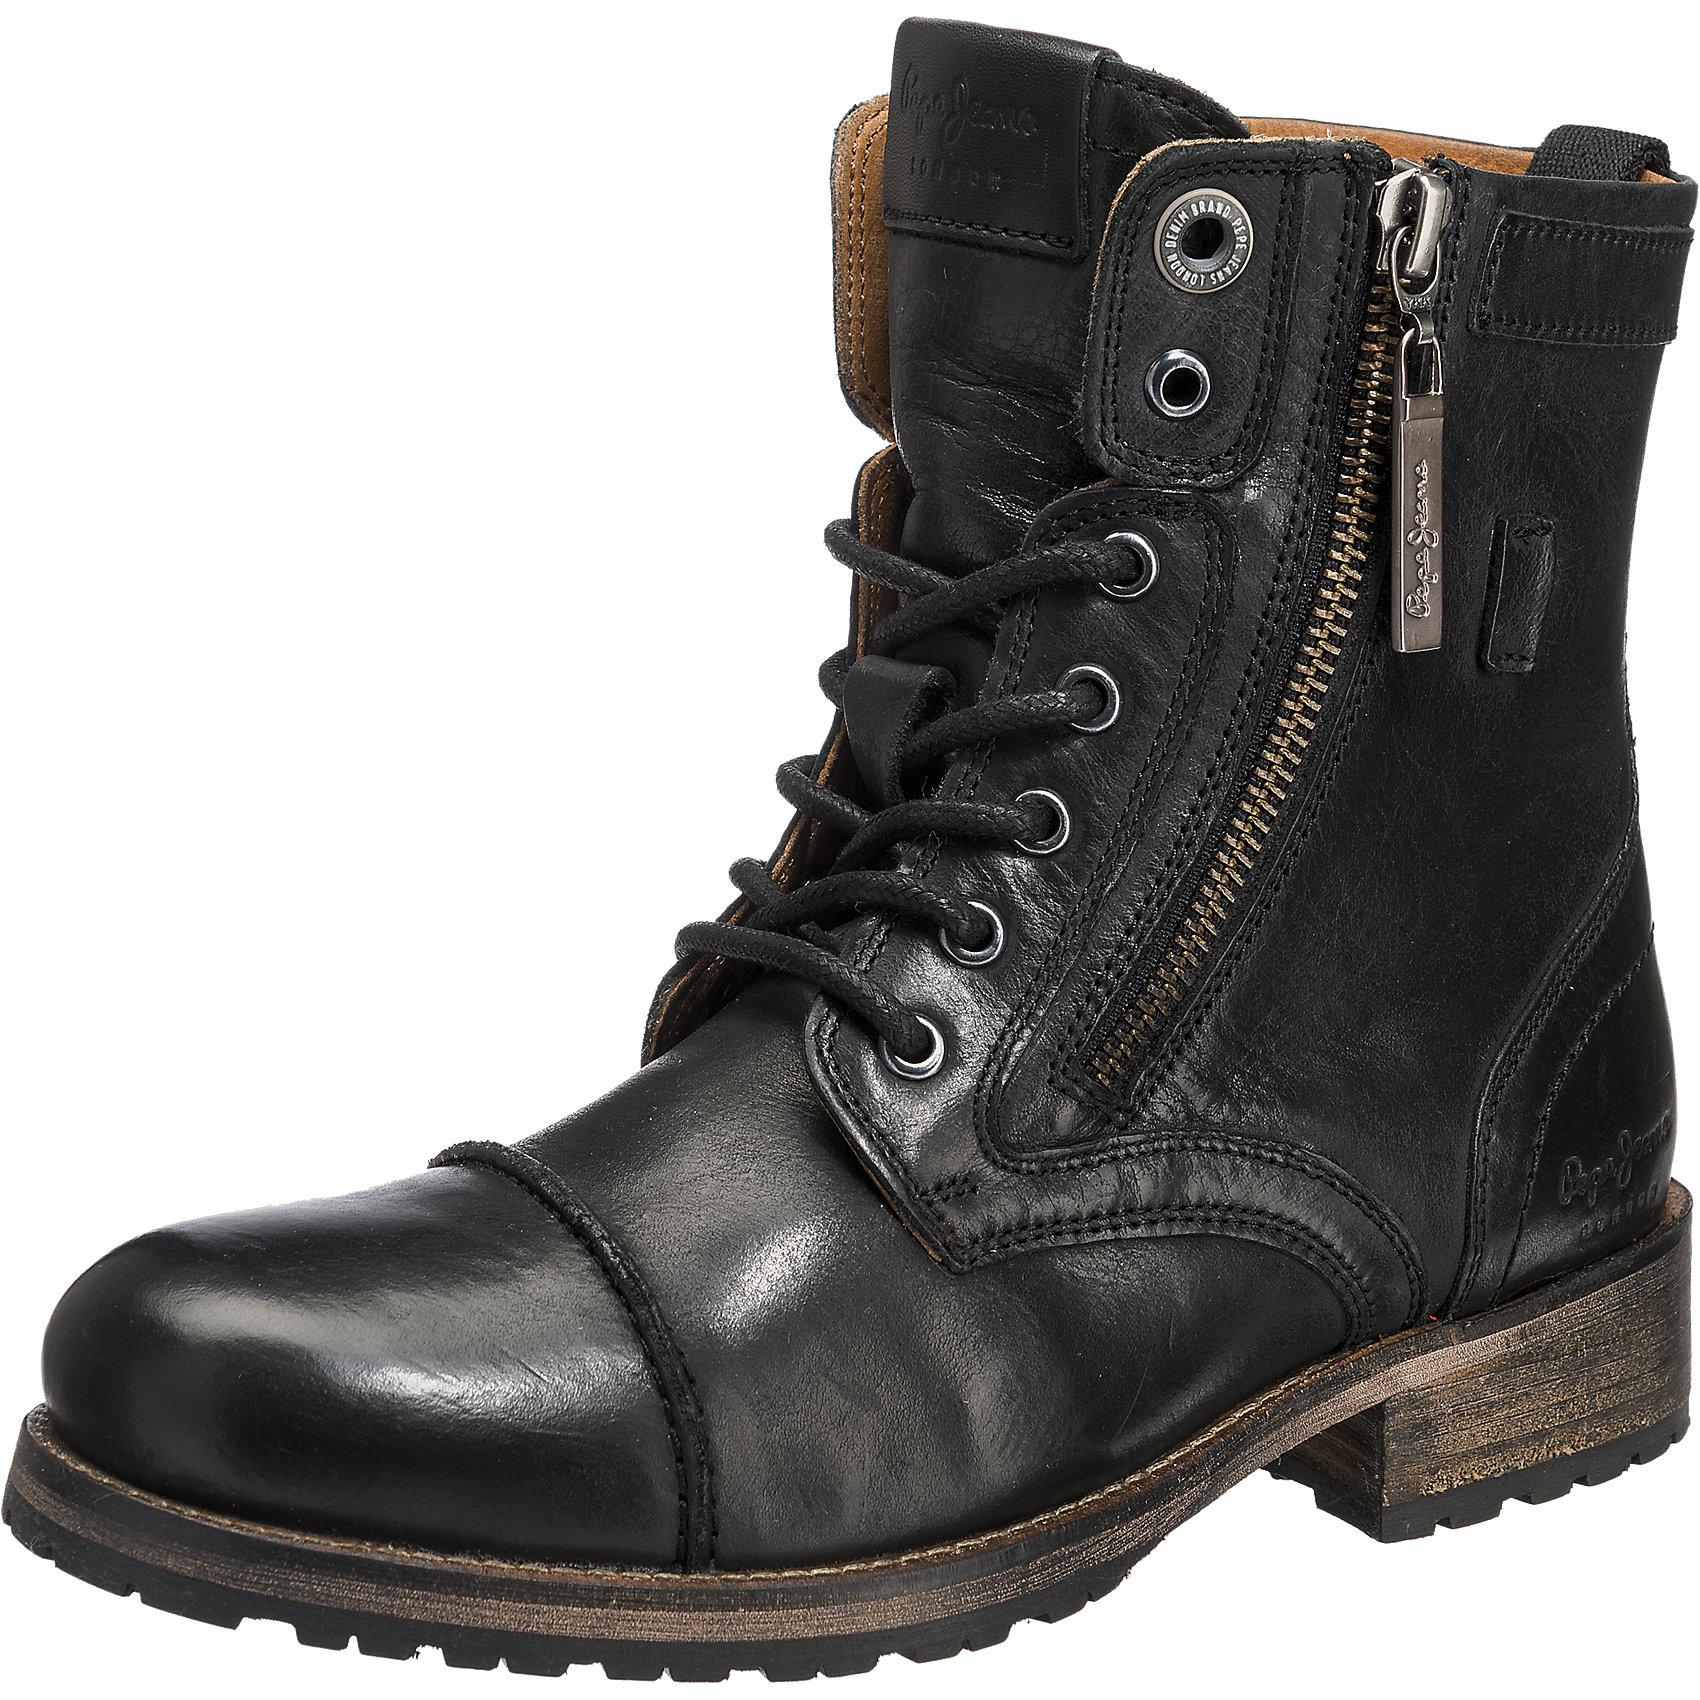 Neu Pepe Jeans MELTING W.ZIPPER für Schnürstiefelette 5758176 für W.ZIPPER Damen 1ce470